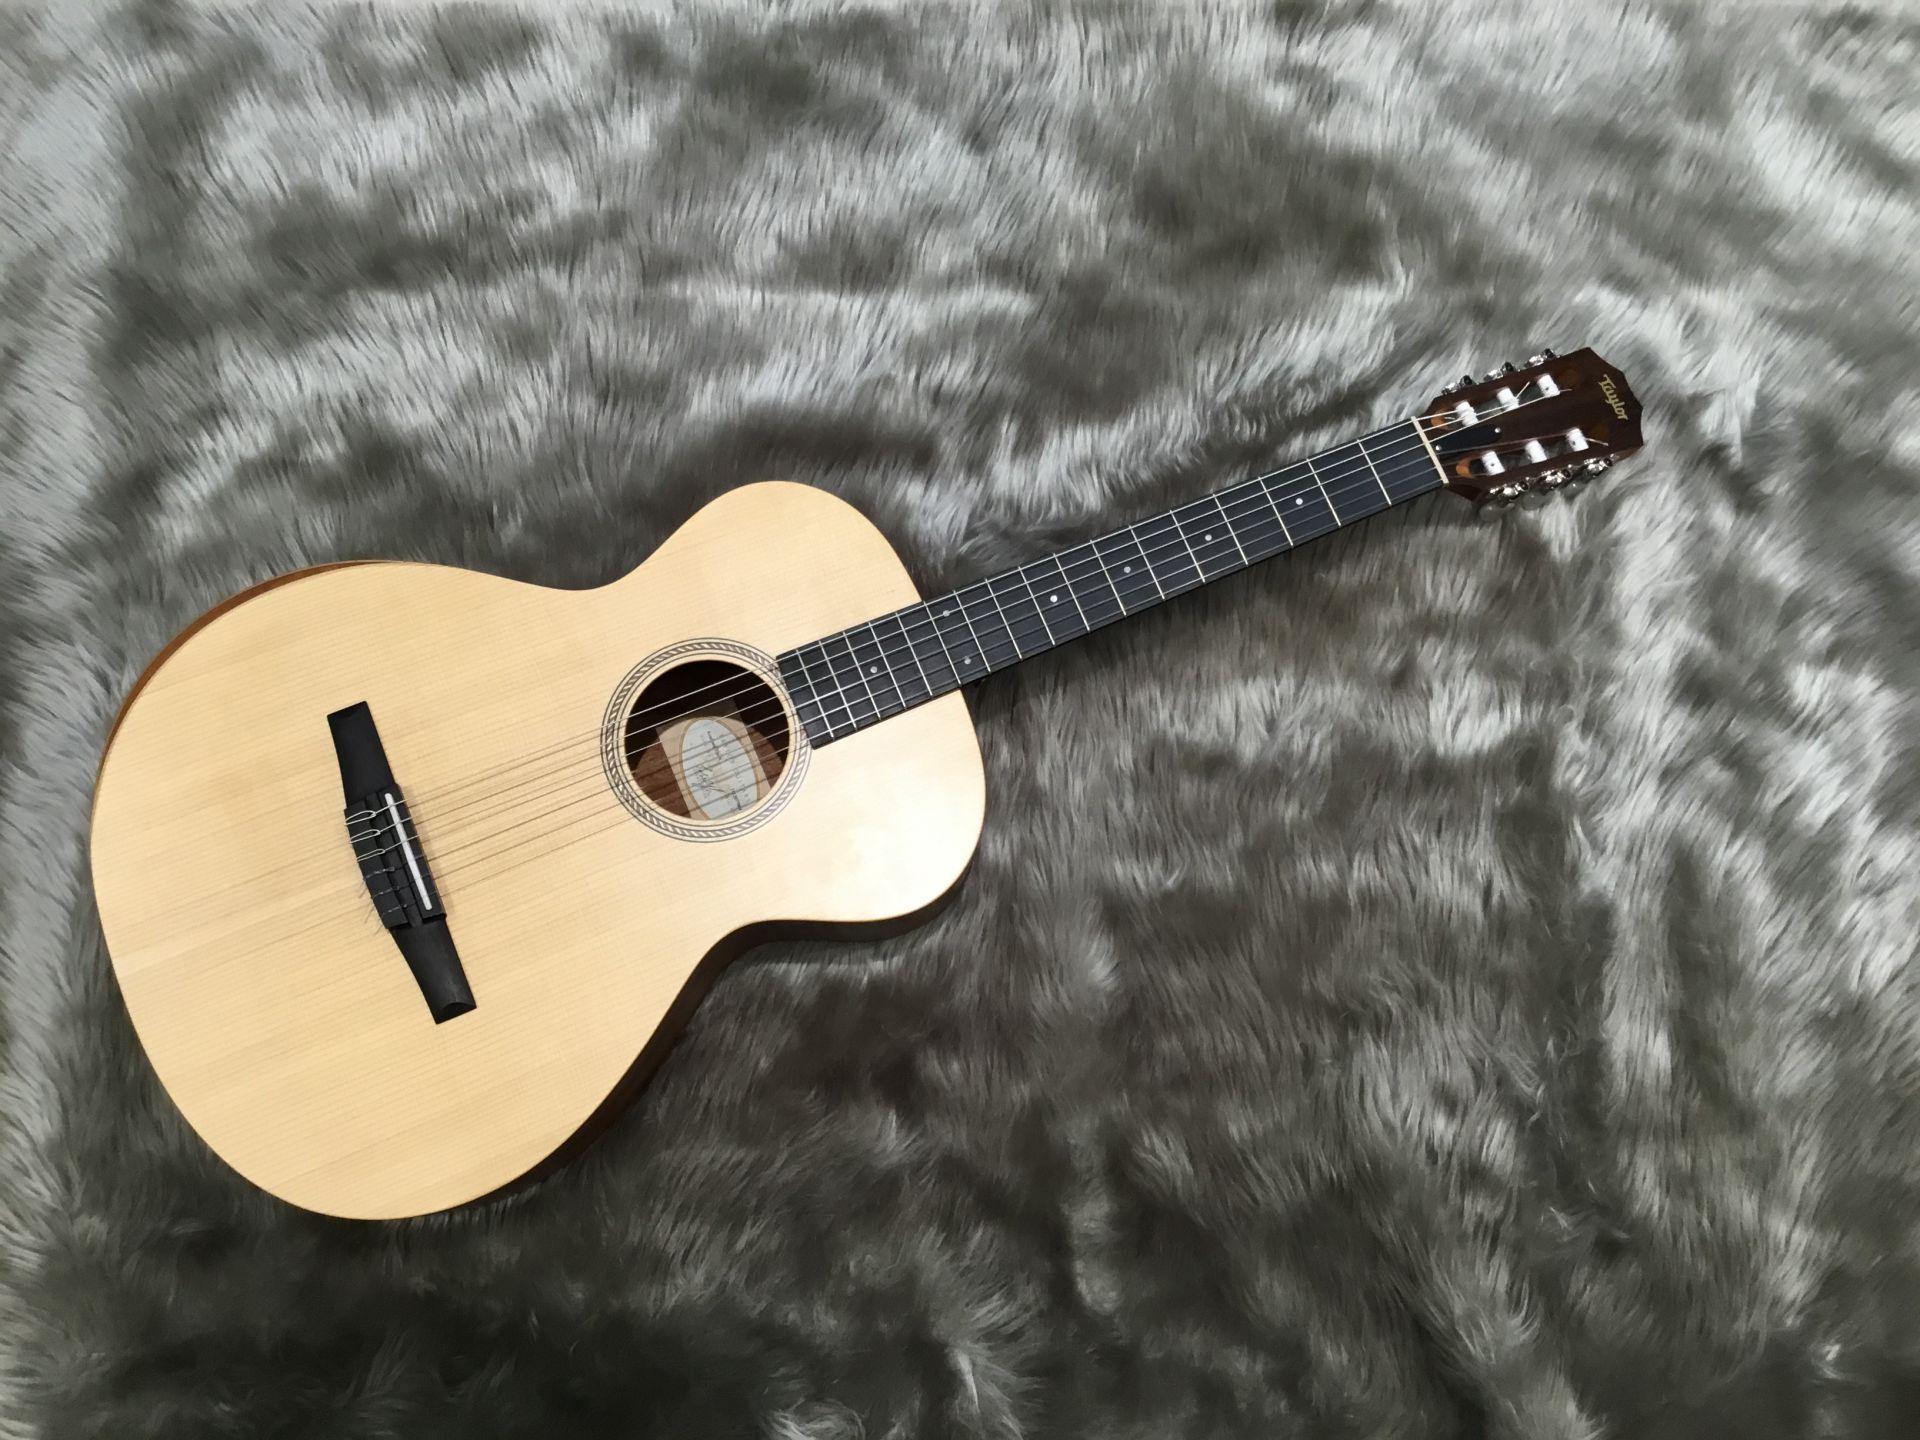 Academy 12e-Nylon – Taylor (Acoustic)